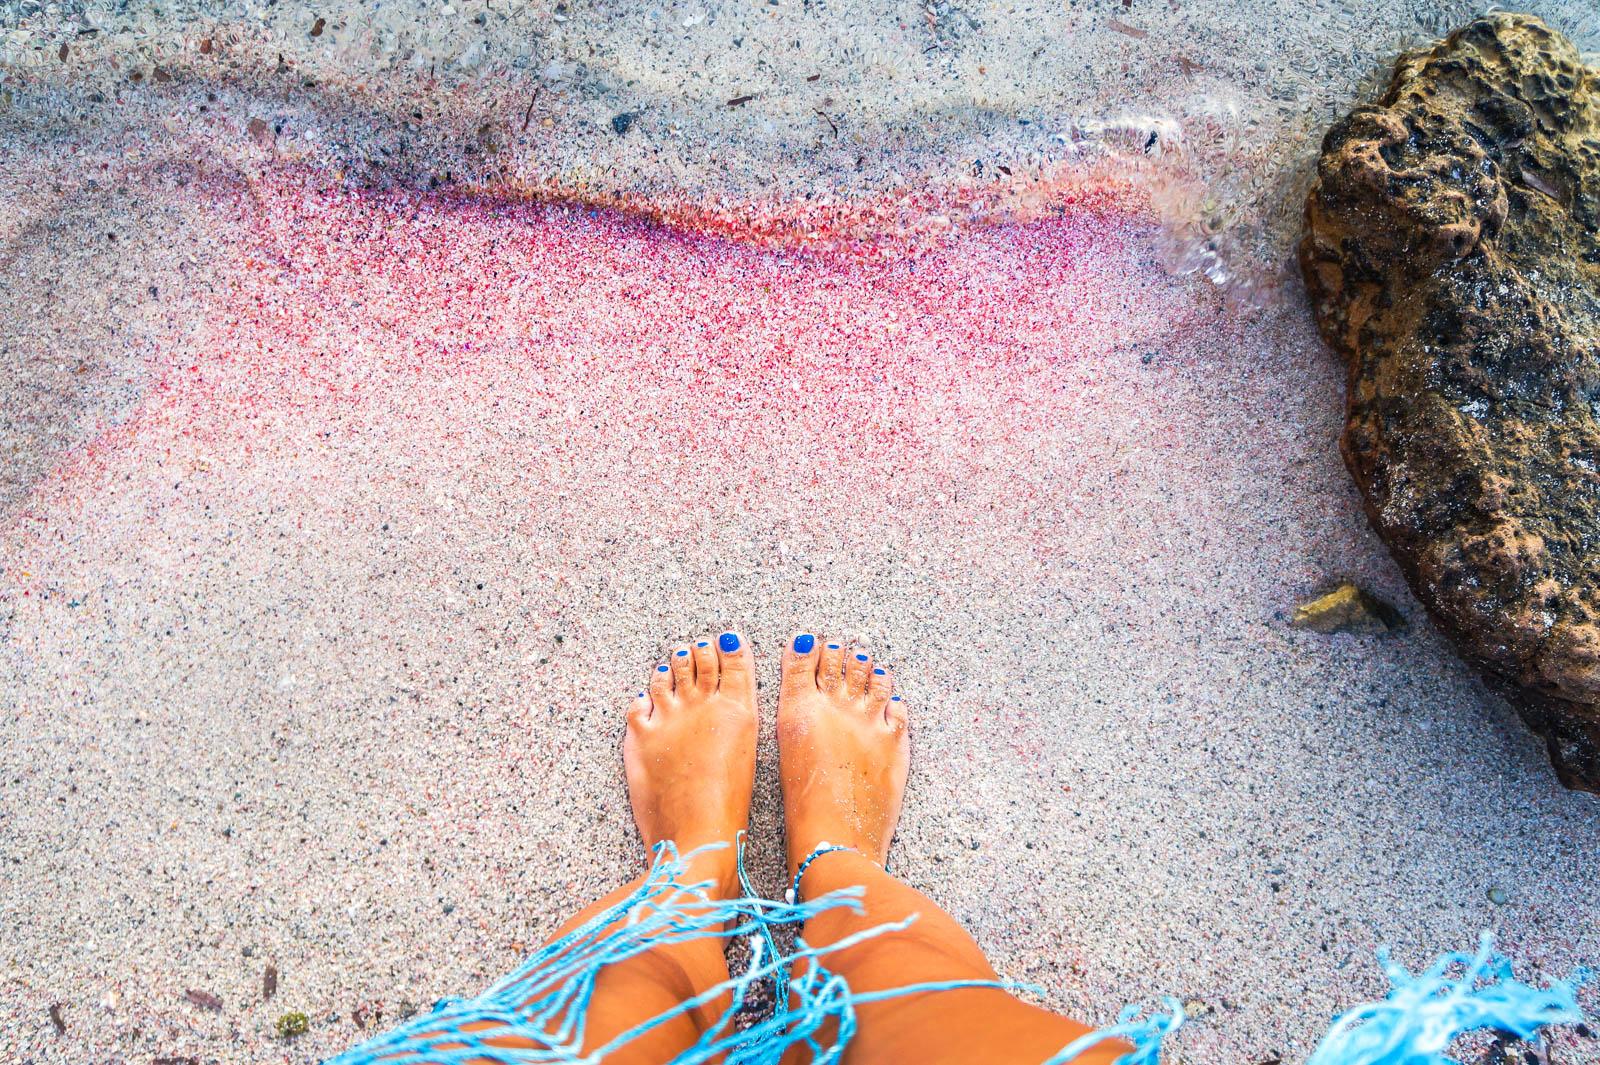 mpalos-beach-crete-greece-la-vie-en-blog-all-rights-reserved-14